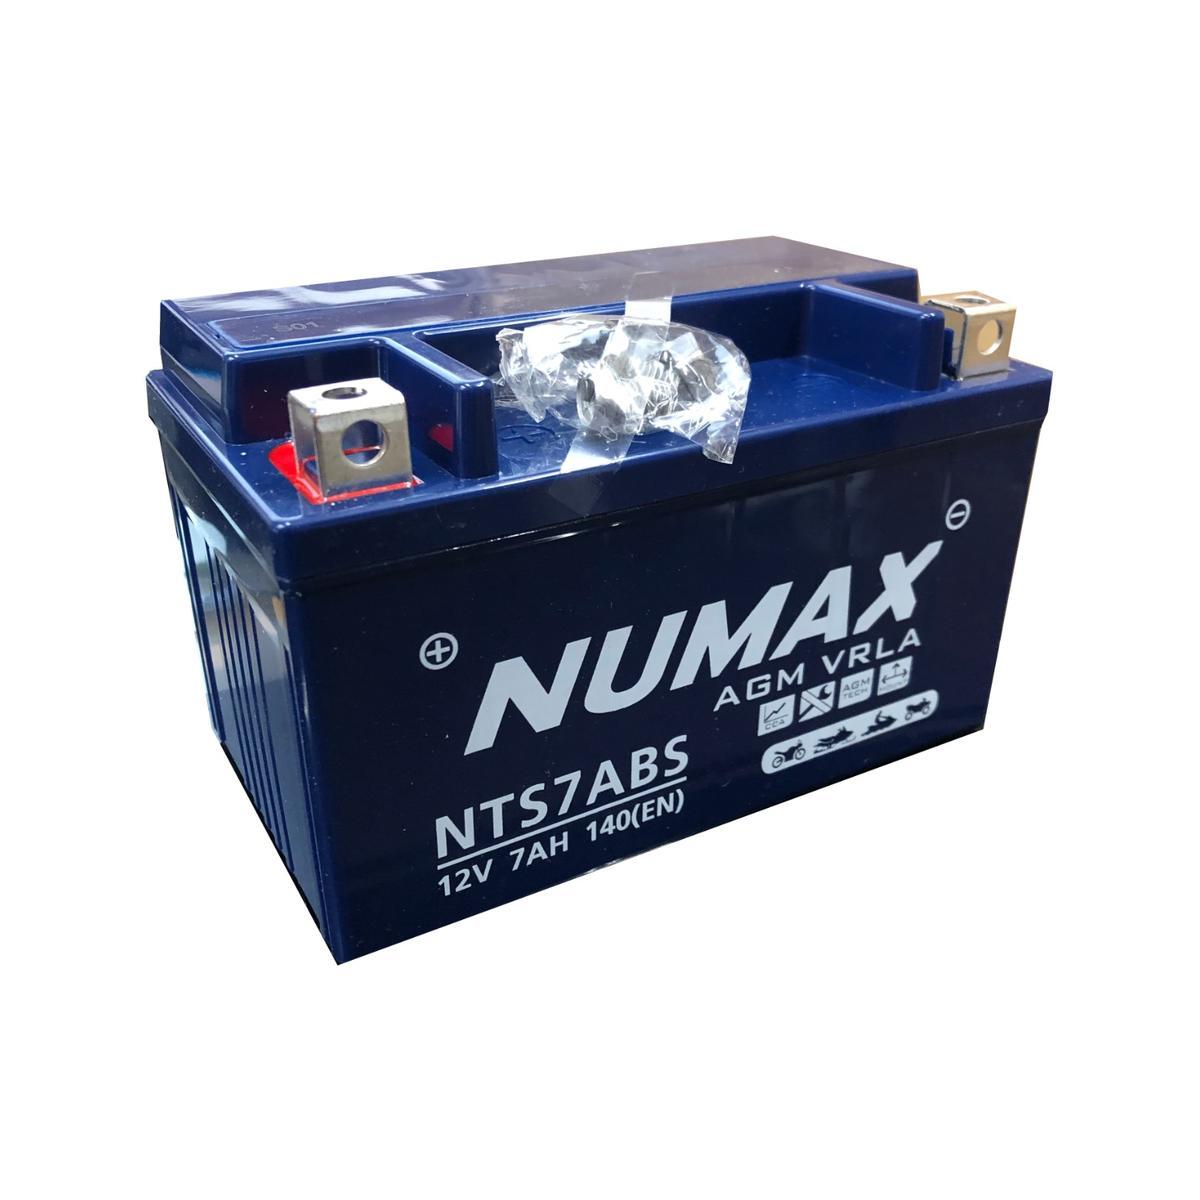 Numax NTS7ABS 12v Motorbike Bike Battery KYMCO 125cc Zing YTX7A-4